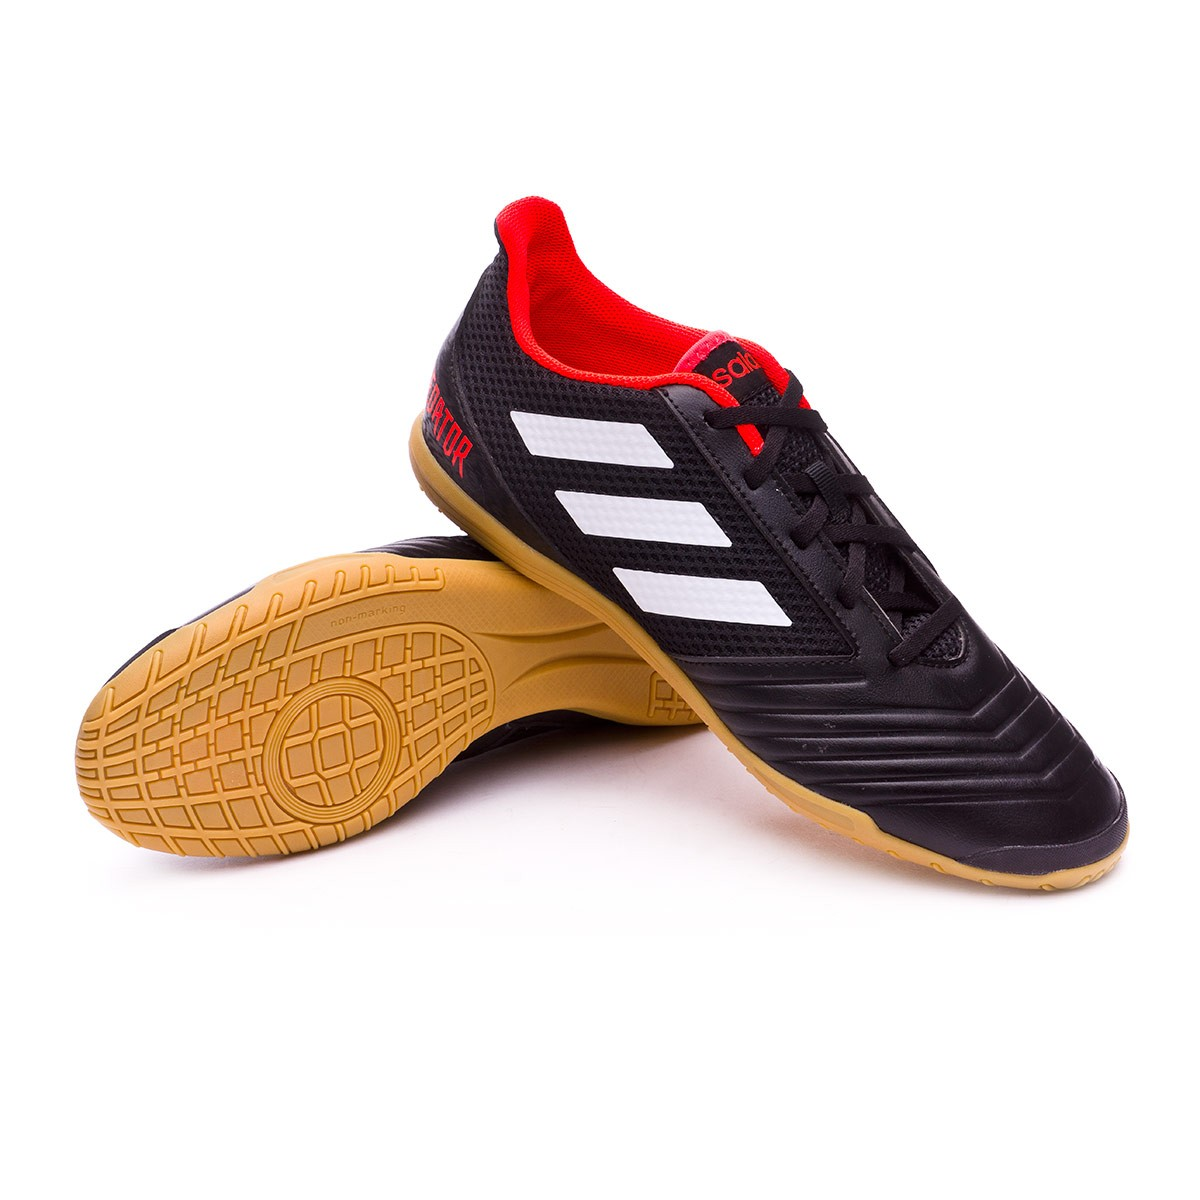 beca343ea9e7c Tenis adidas Predator Tango 18.4 Sala White-Core black-Real coral - Tienda  de fútbol Fútbol Emotion